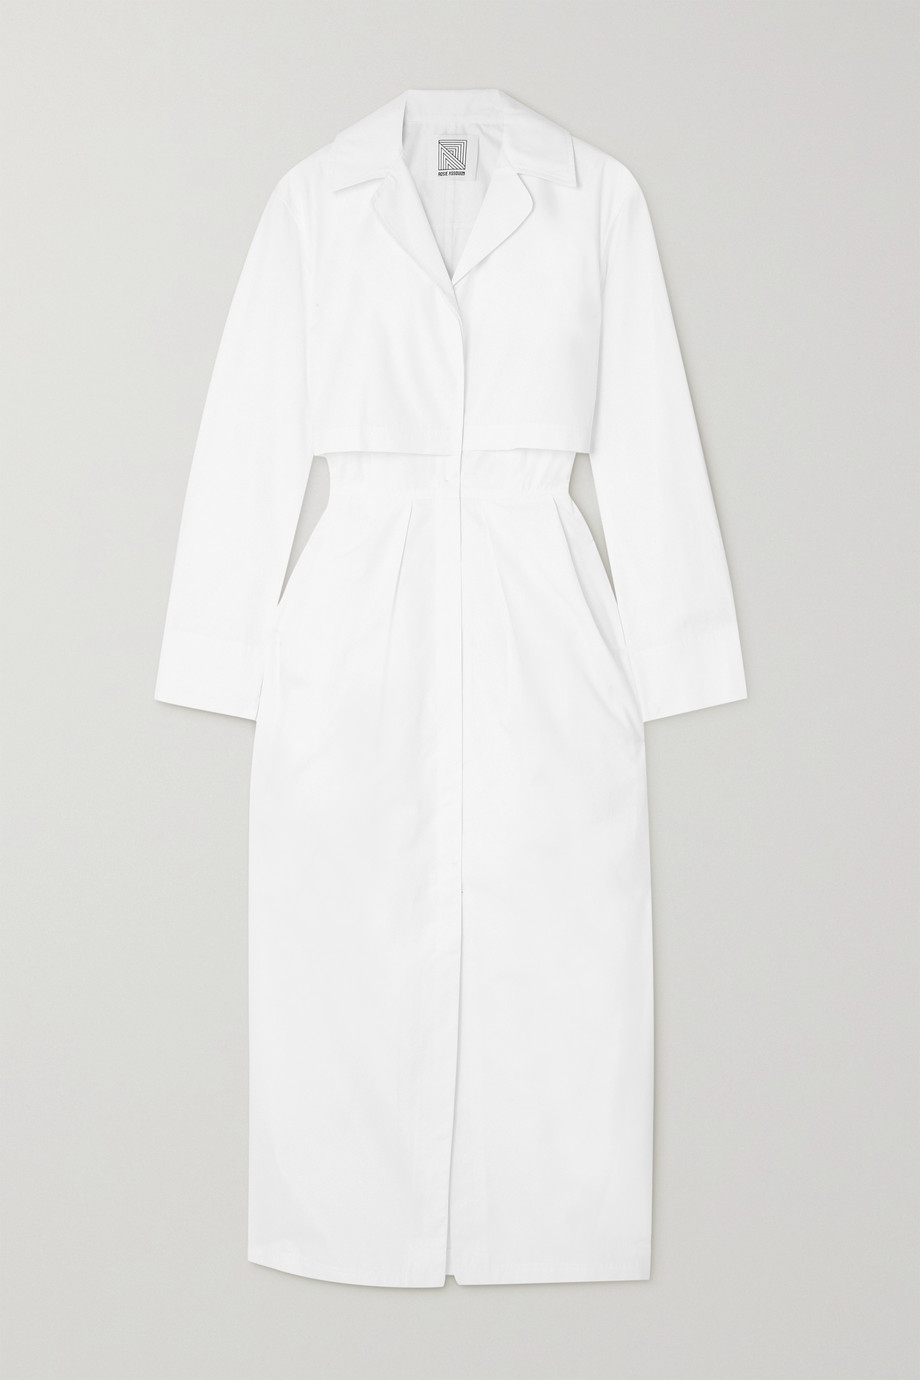 Rosie Assoulin Layered cotton-poplin midi dress